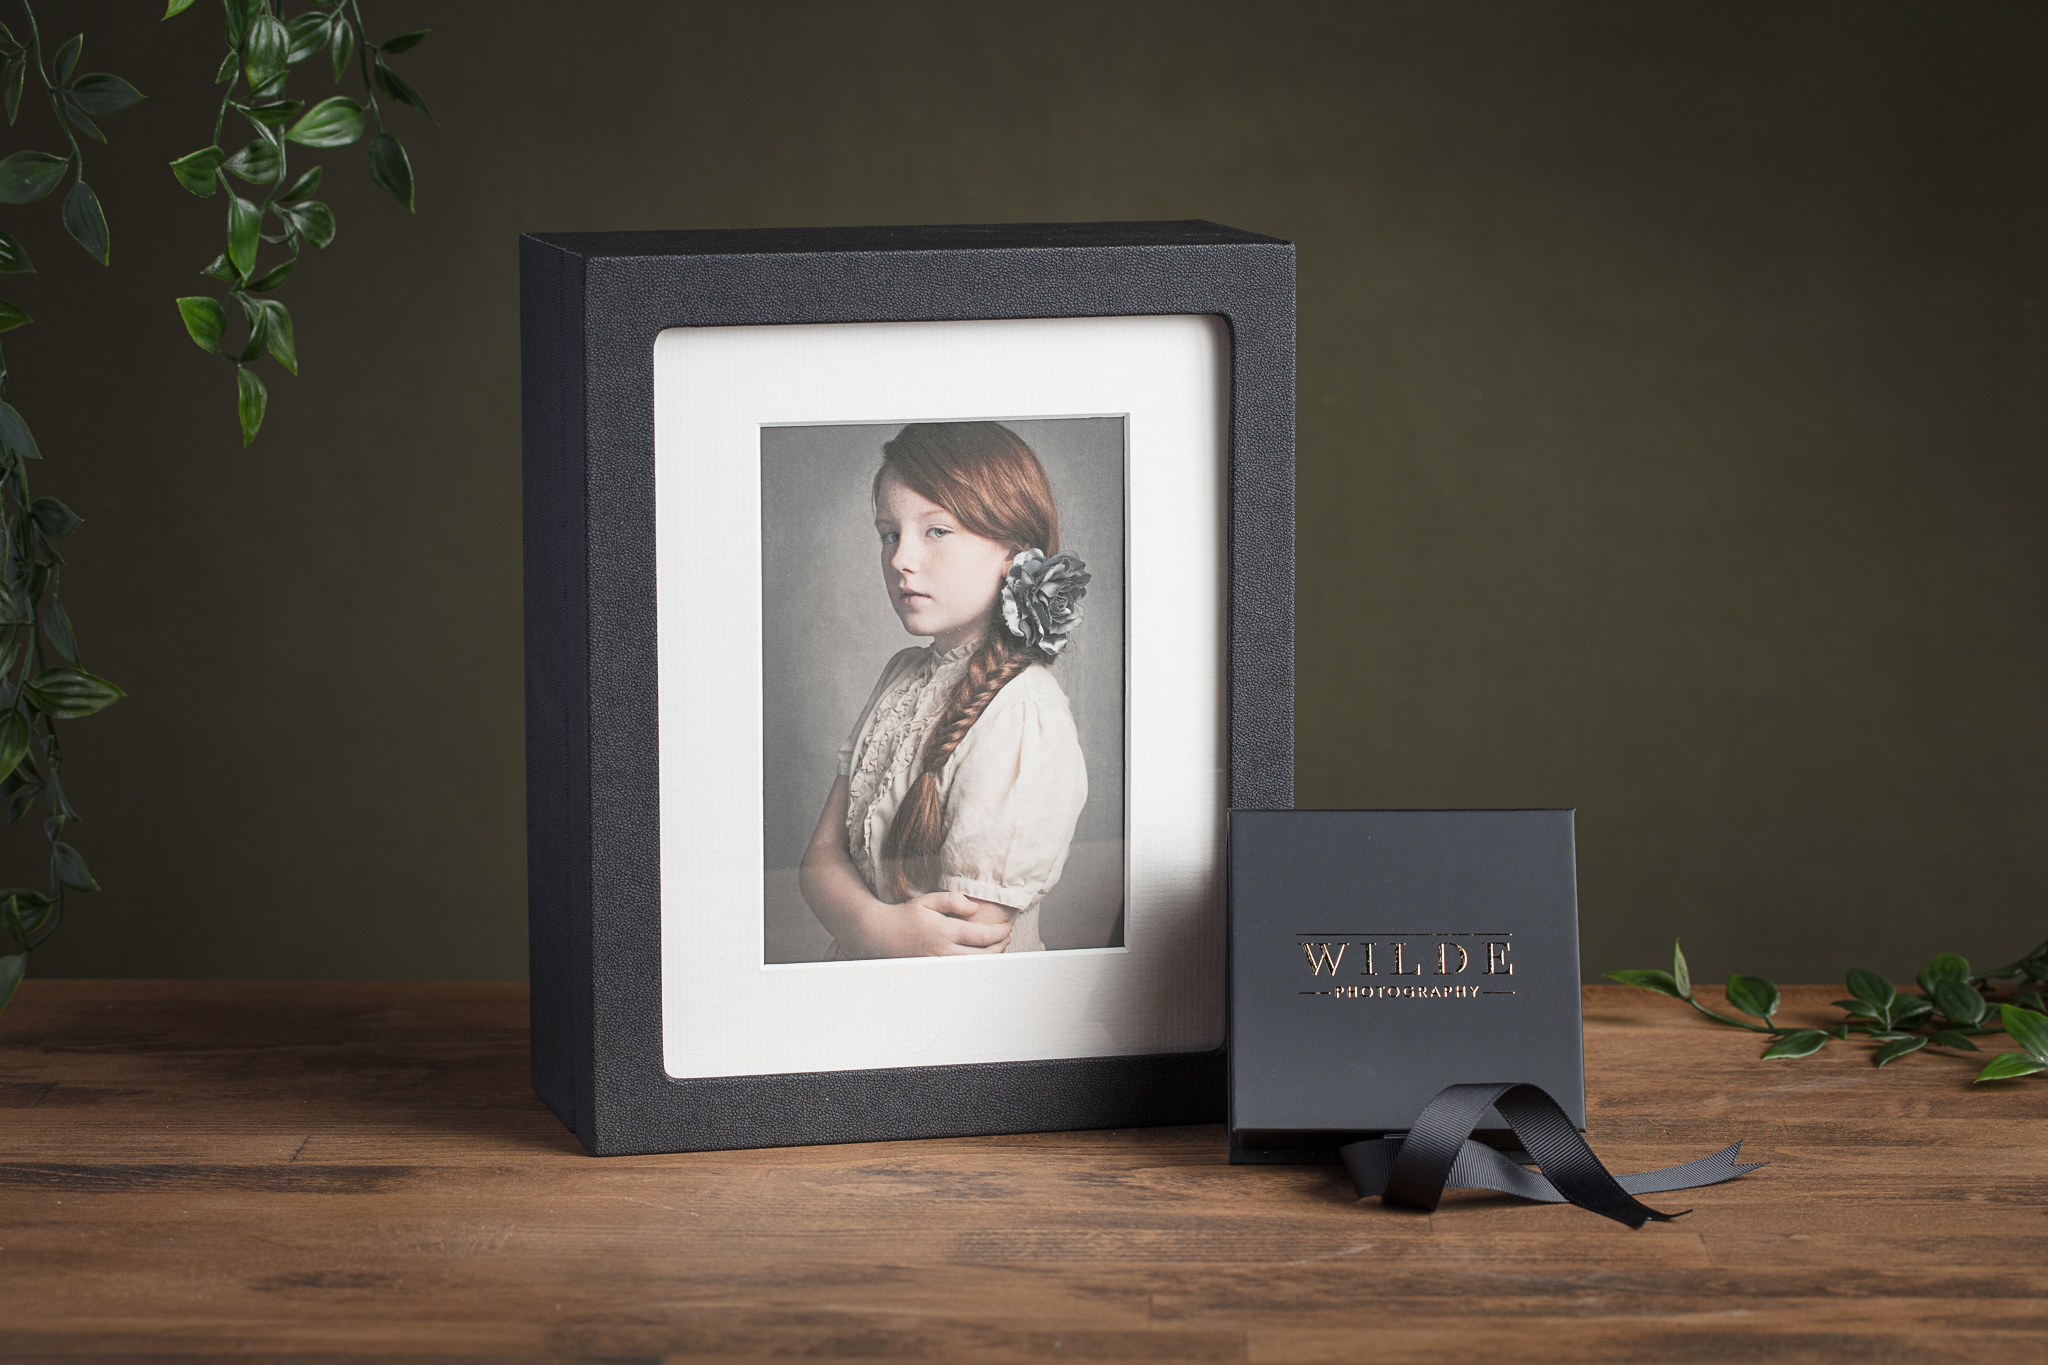 * New Premium Window Presentation Folio Box and Signature USB Box